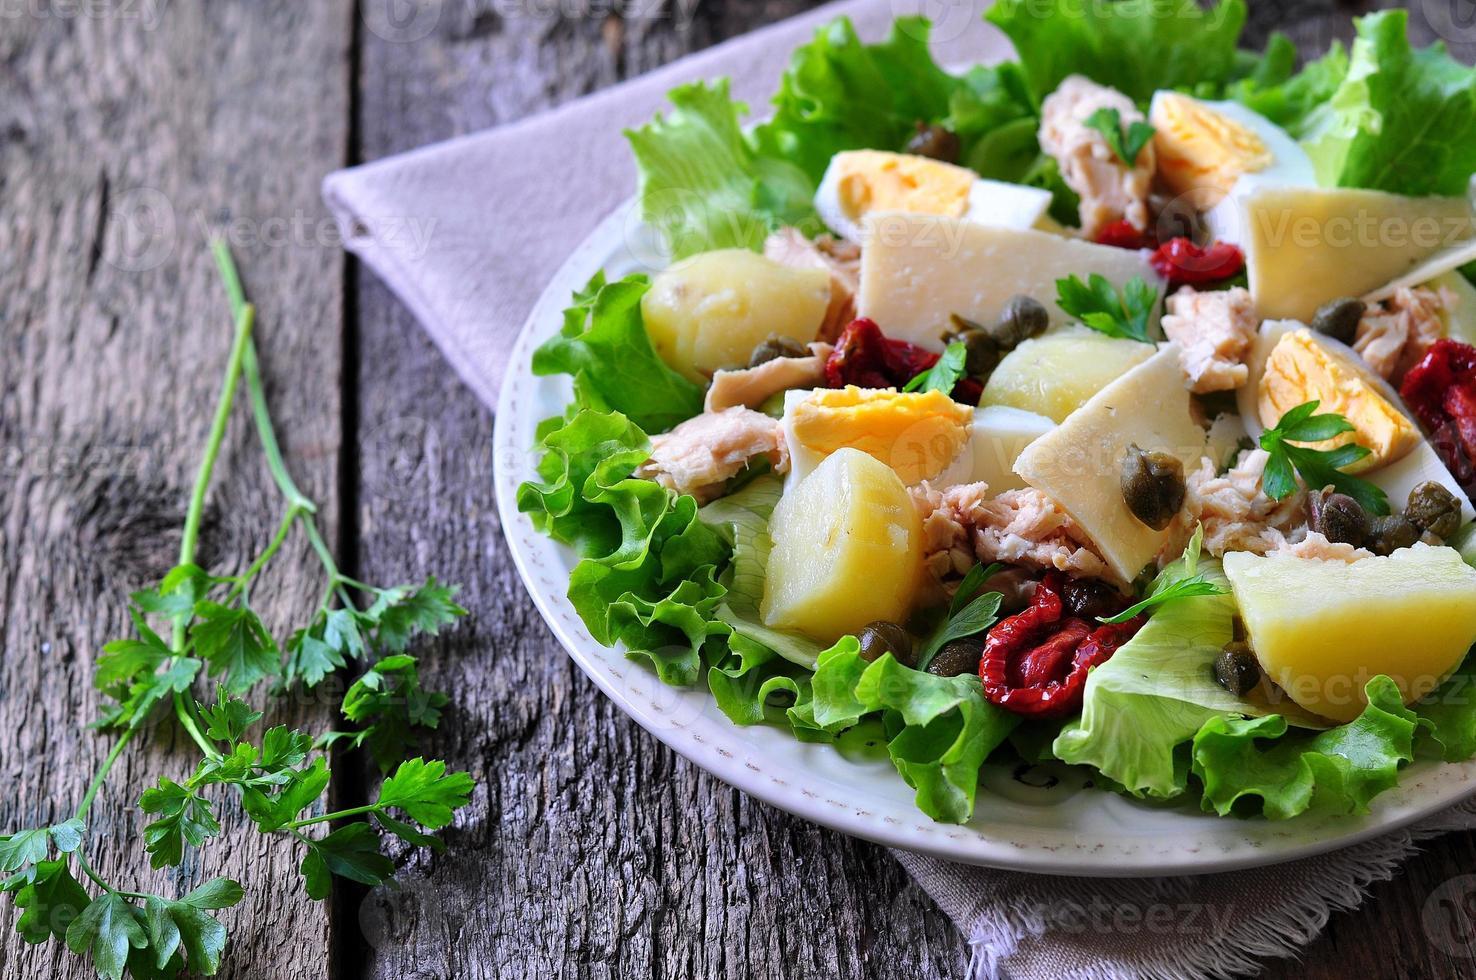 Salat aus Salat, Eisbergsalat, mit Thunfischkonserven, getrockneten Tomaten foto